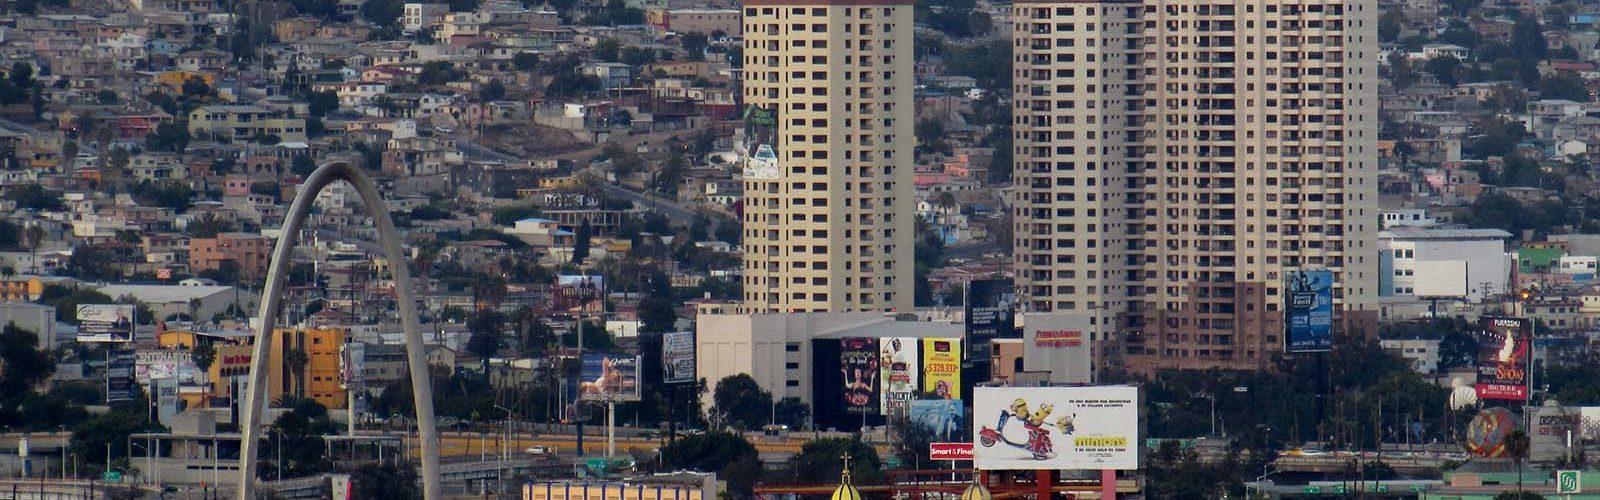 journee-tijuana-mexique-ville-frontaliere-san-diego-une